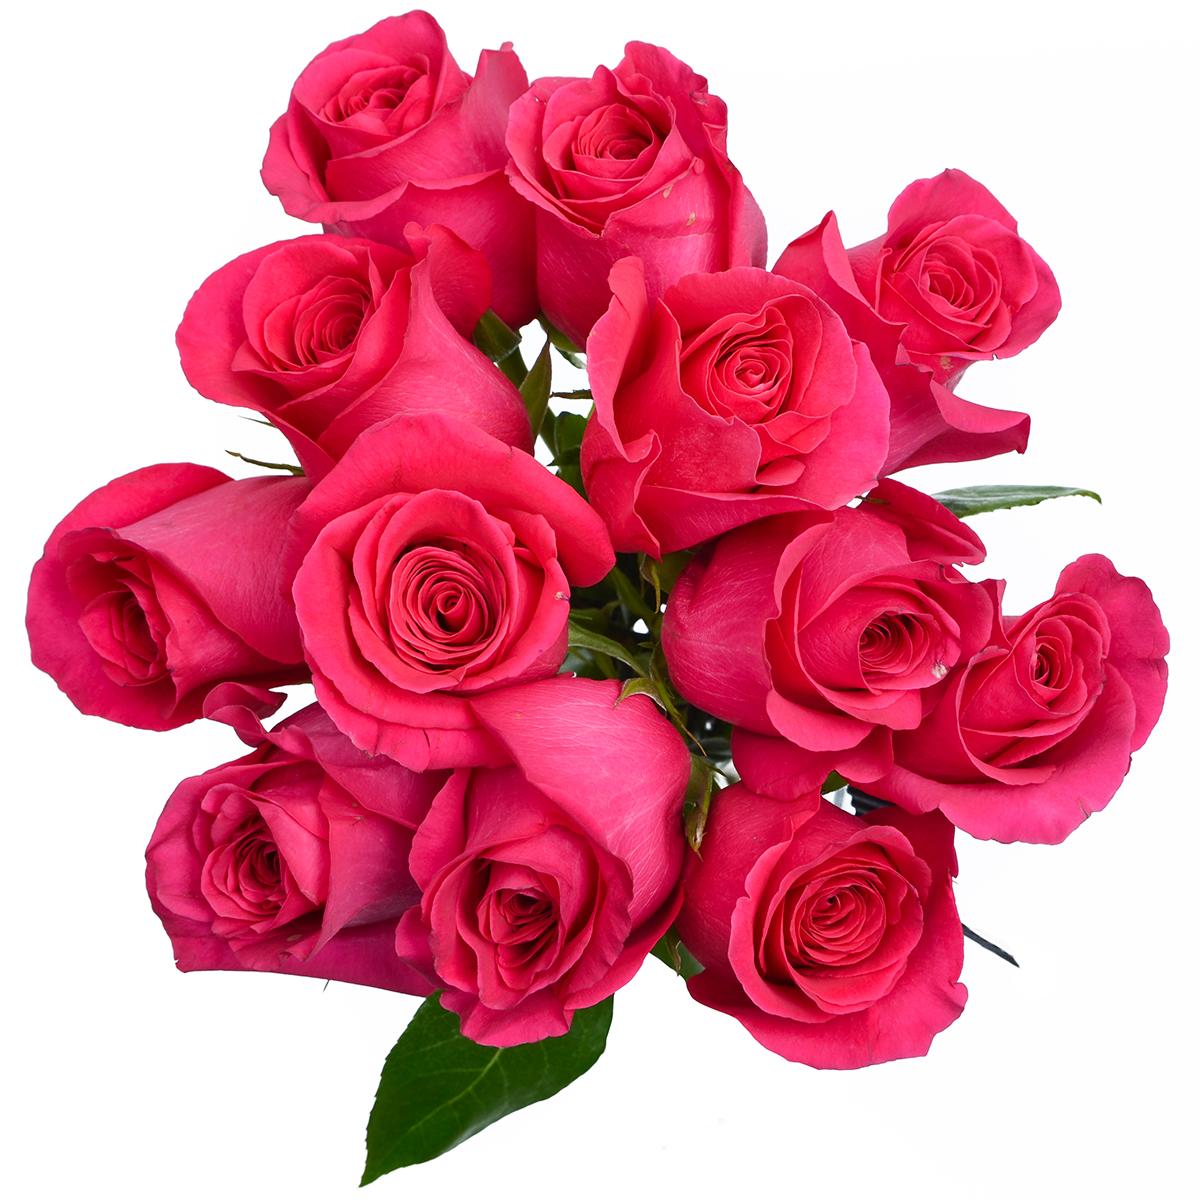 Rose Pink Floyd Stems Ship Cut Flowers